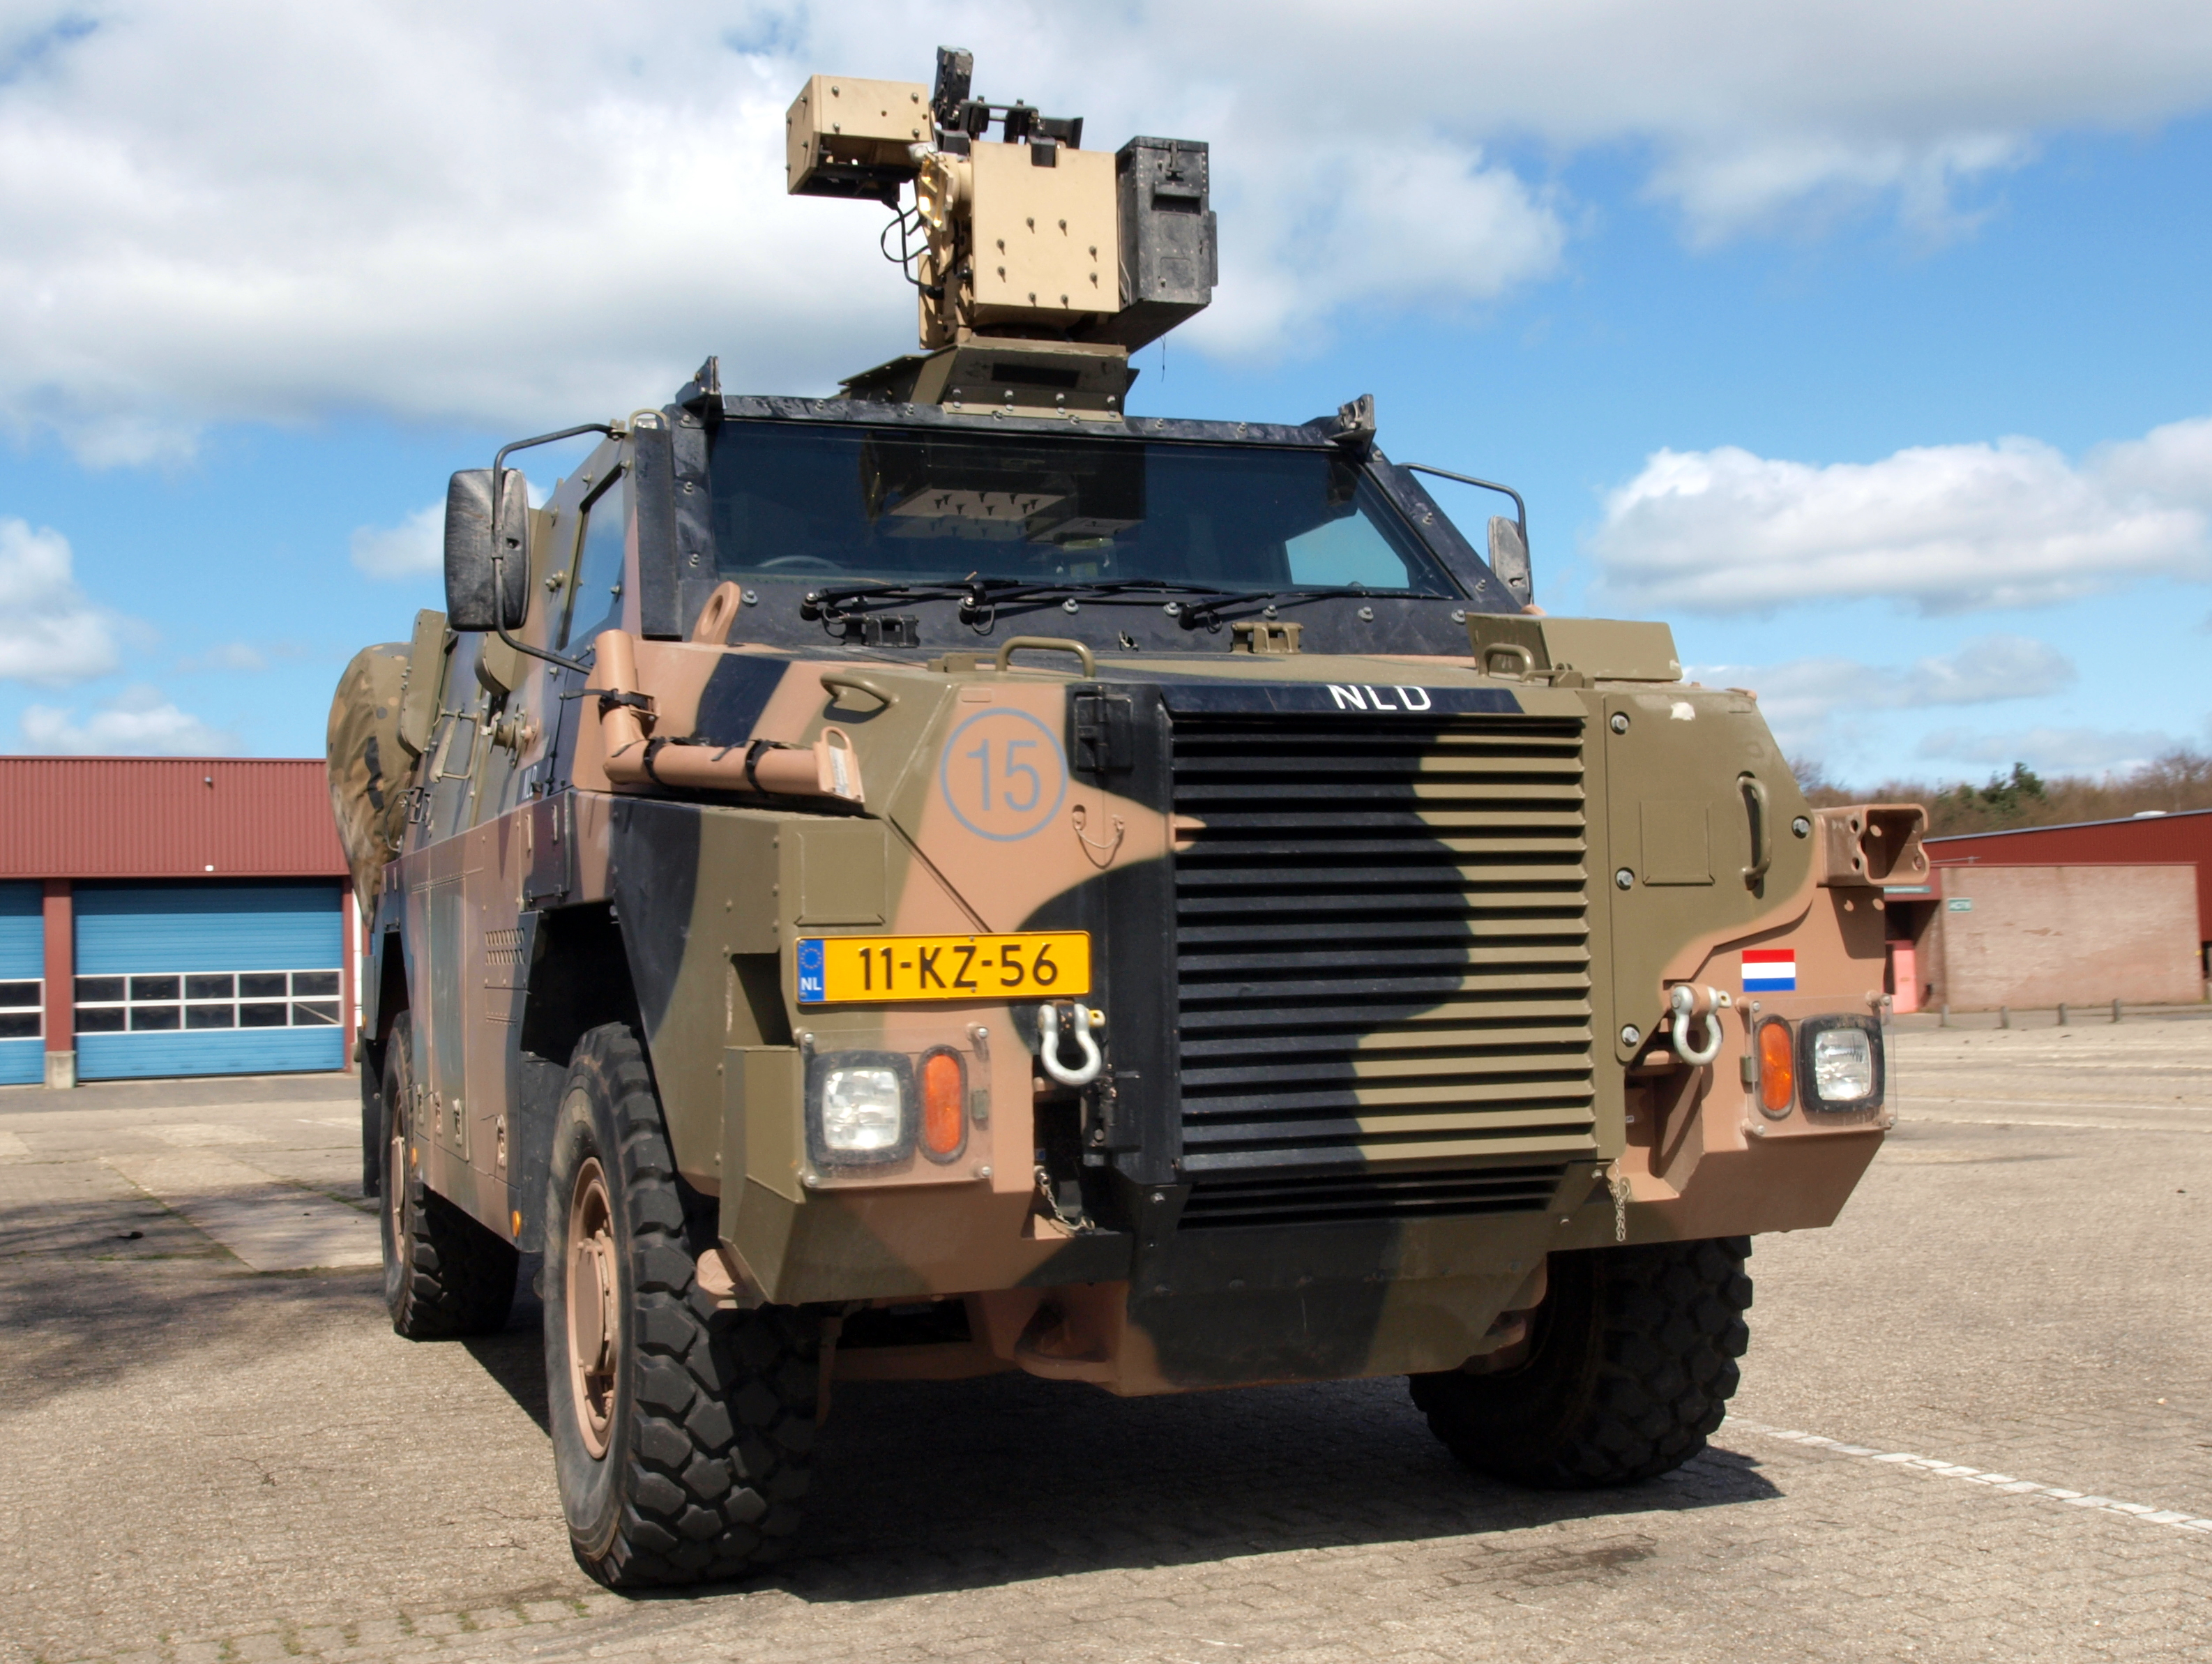 File:Royal Netherlands Army Bushmaster APV, VAU 12kN 4X4 ...